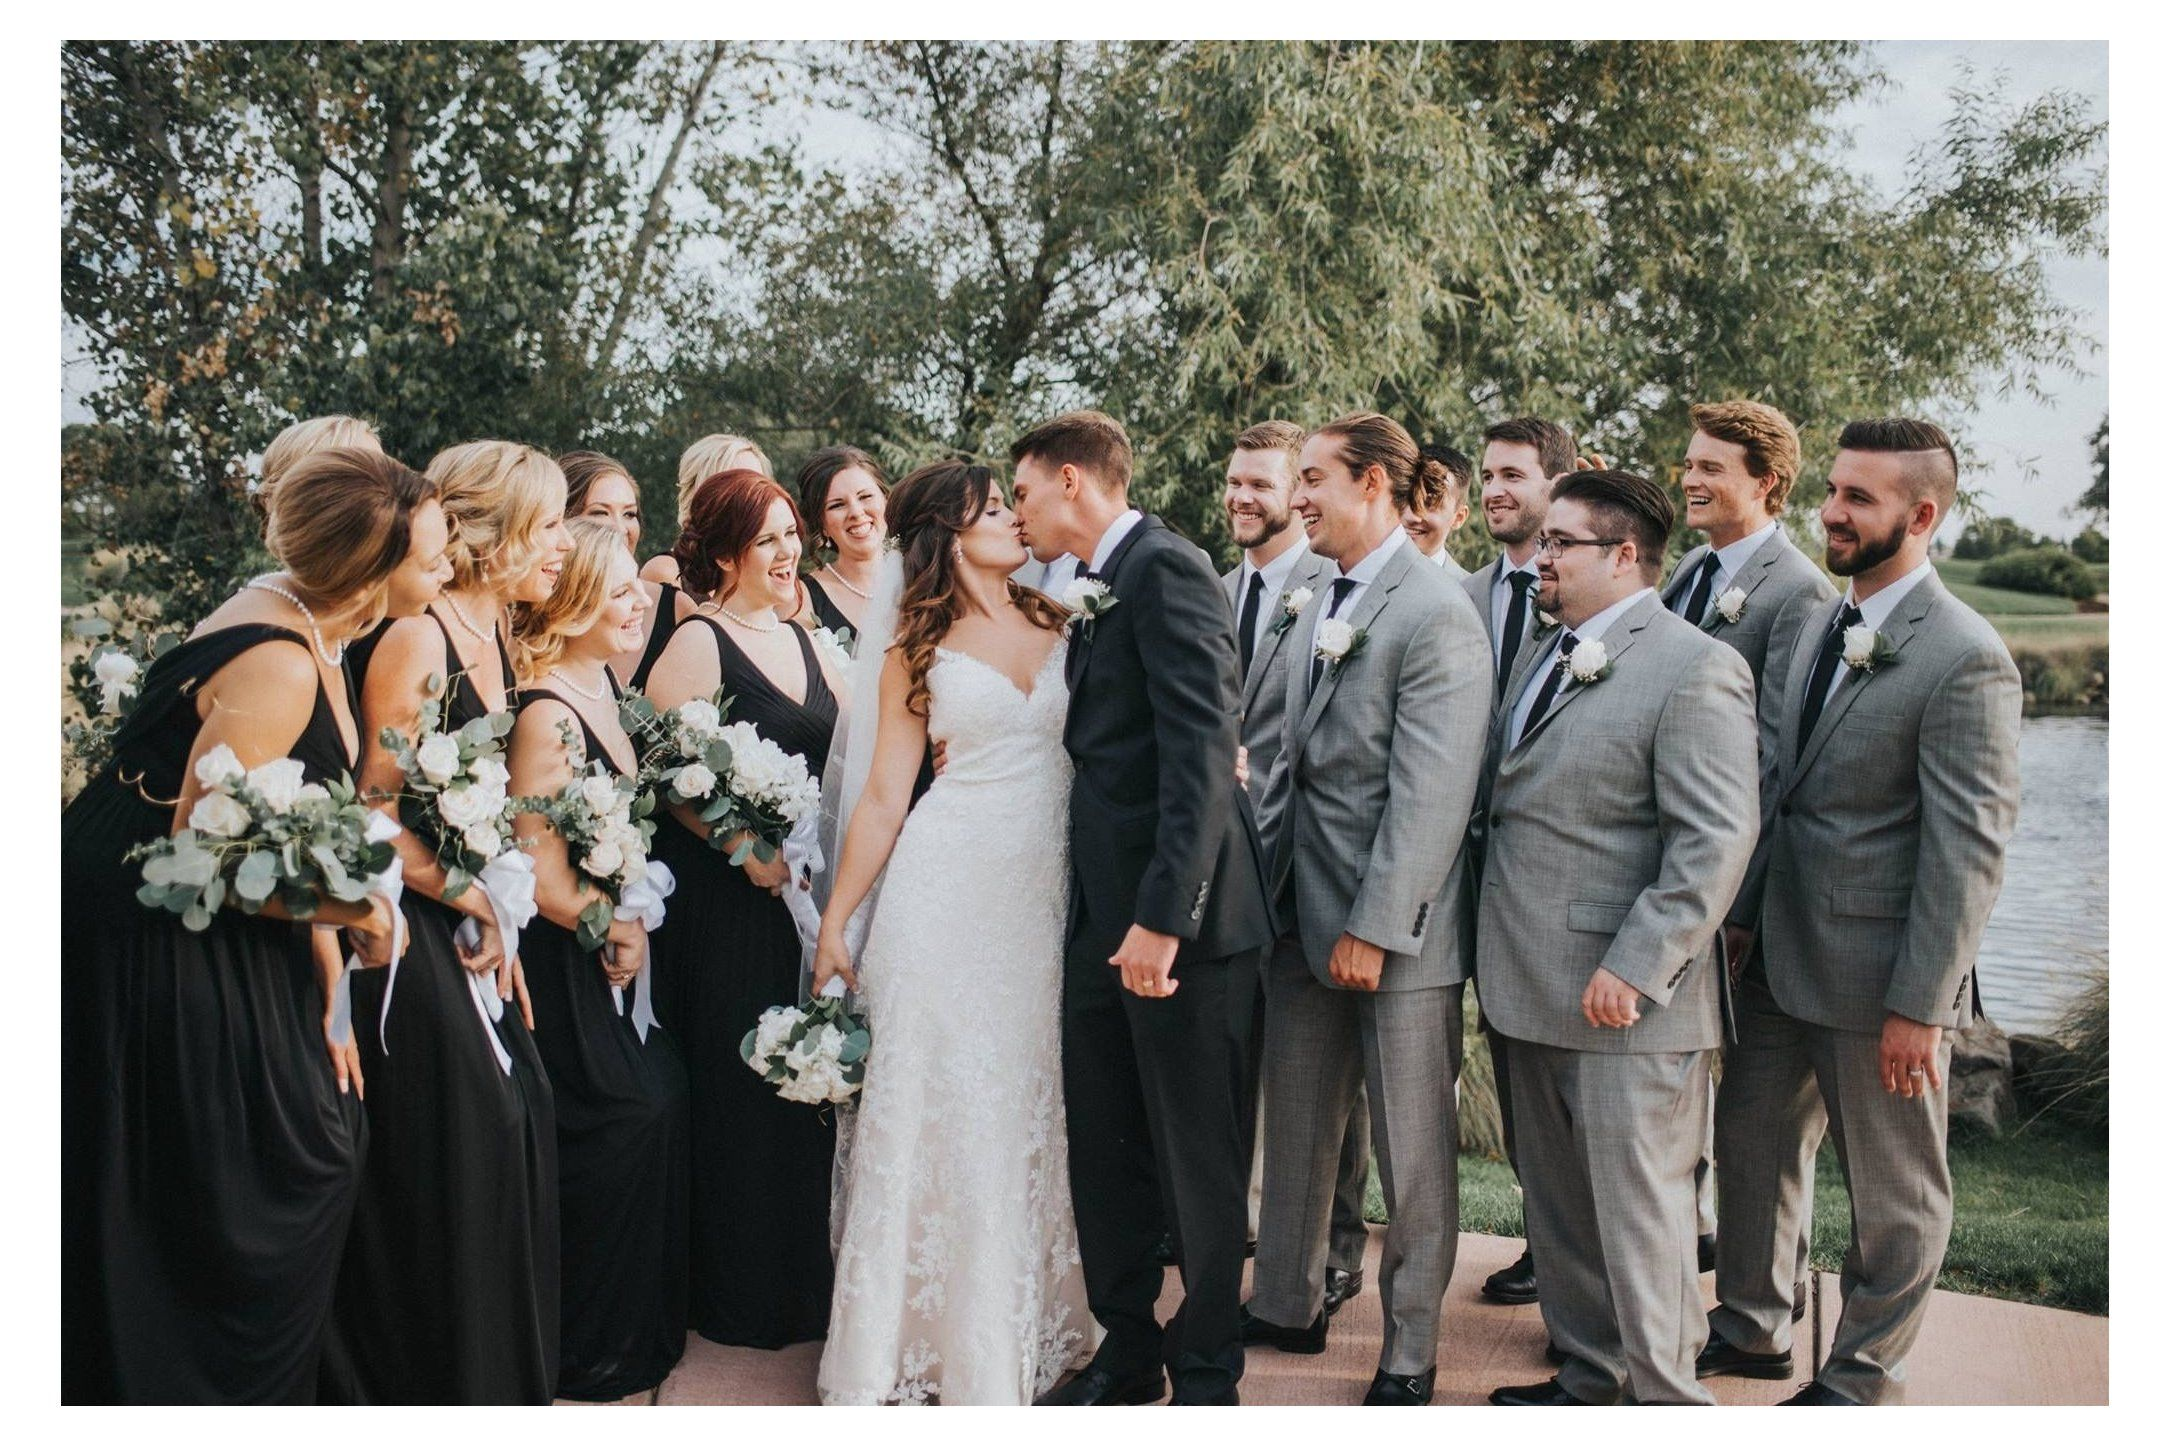 Black Bridesmaid Dresses Grey Groomsmen Blackbridesmaiddressesgreygroomsmen Dav In 2021 Black Bridesmaid Dresses Black And White Wedding Theme Grey Wedding Theme [ 1446 x 2170 Pixel ]